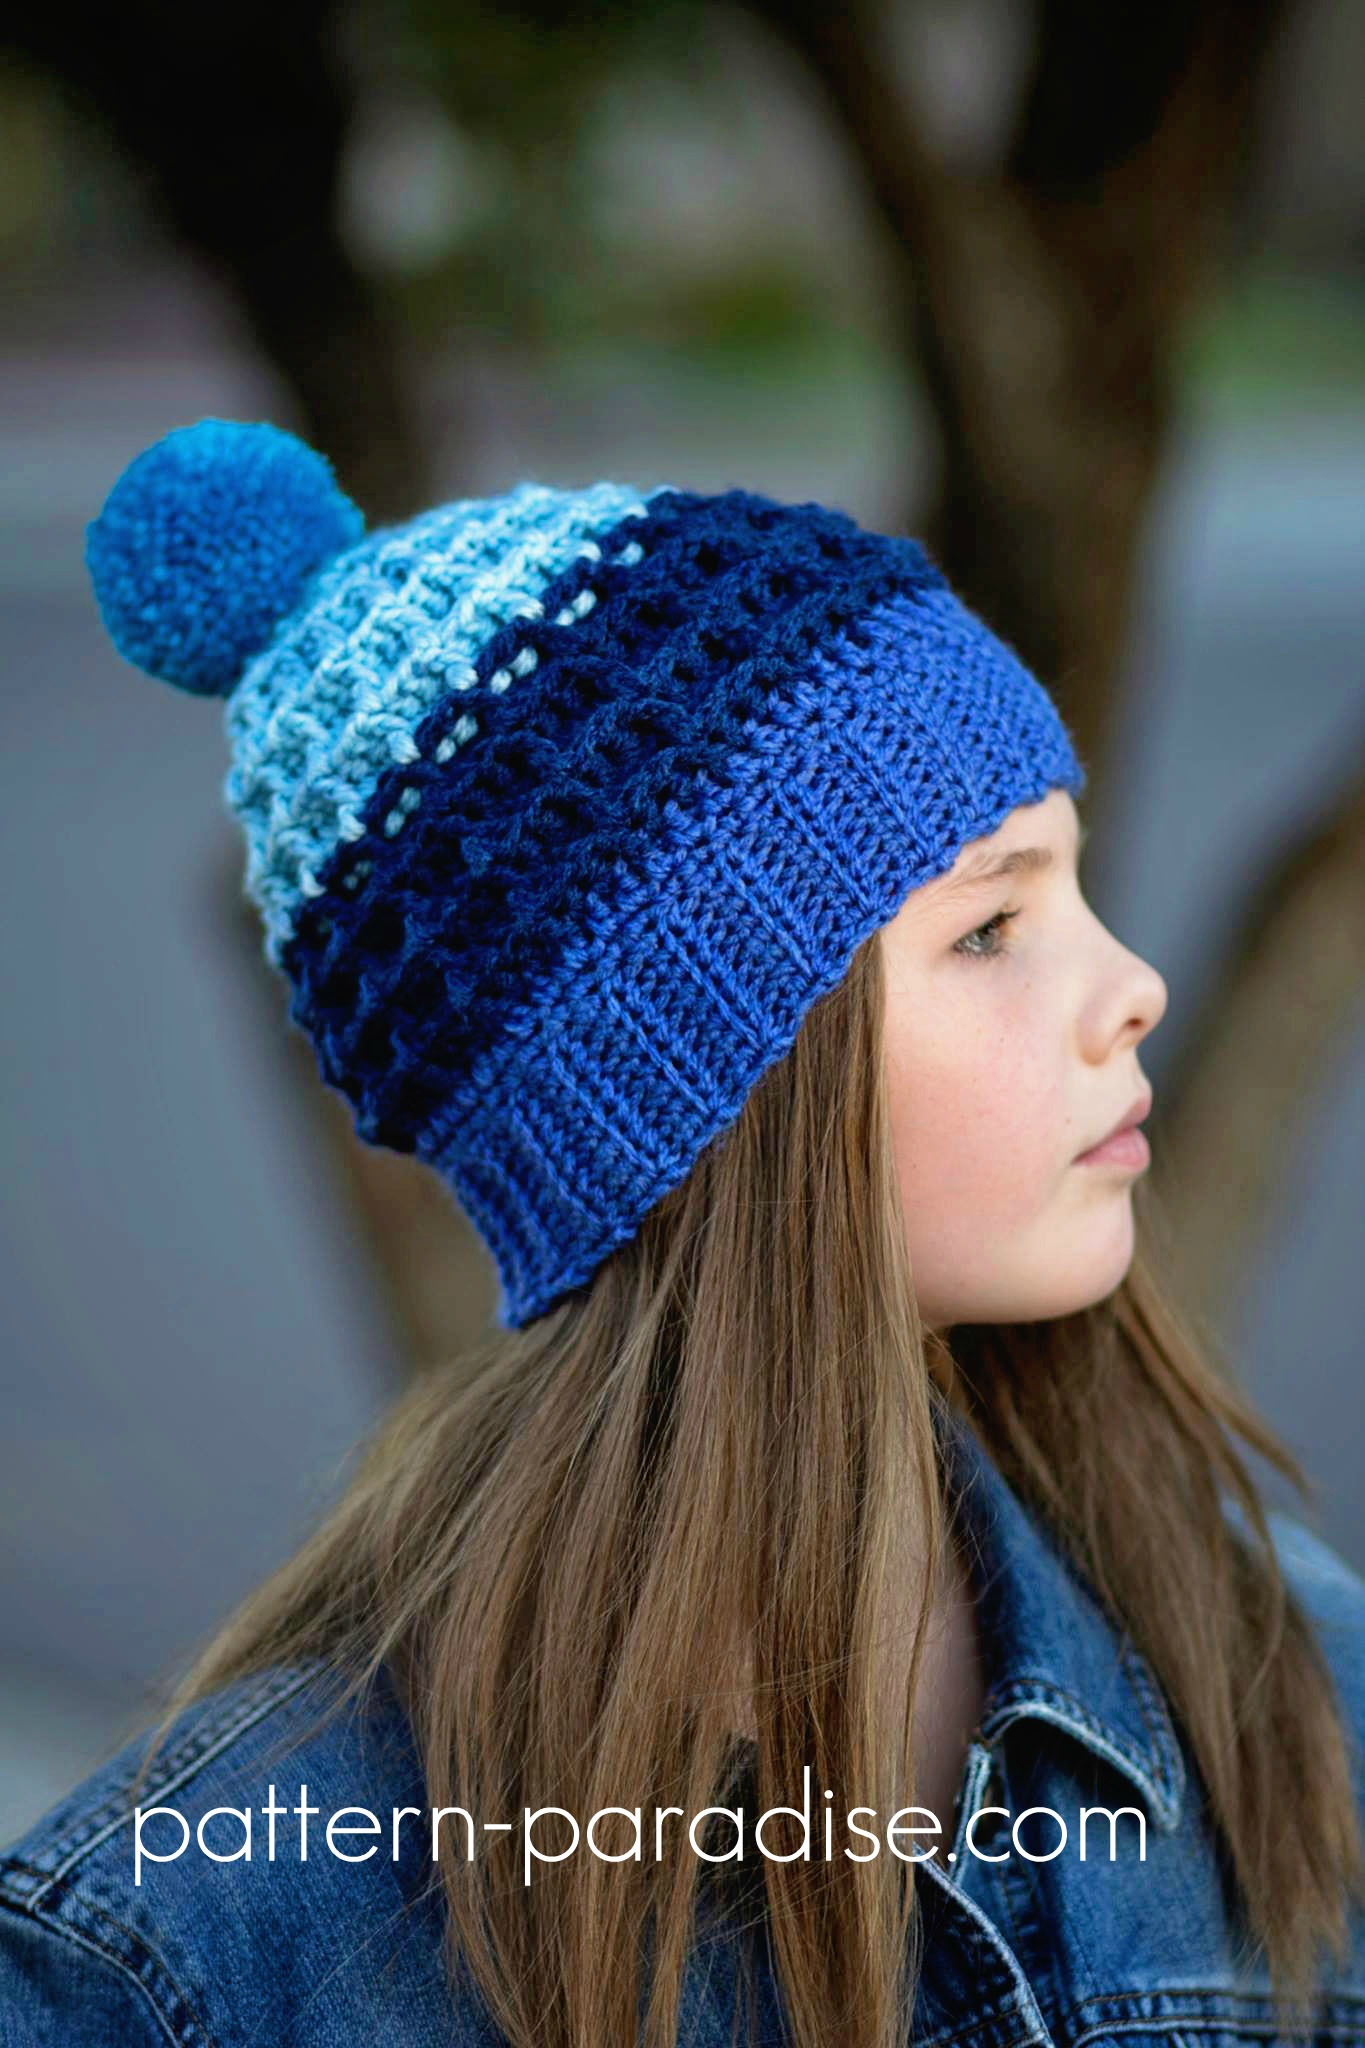 crochet beanie free crochet pattern: alpine nights beanie | pattern paradise jcdrtok